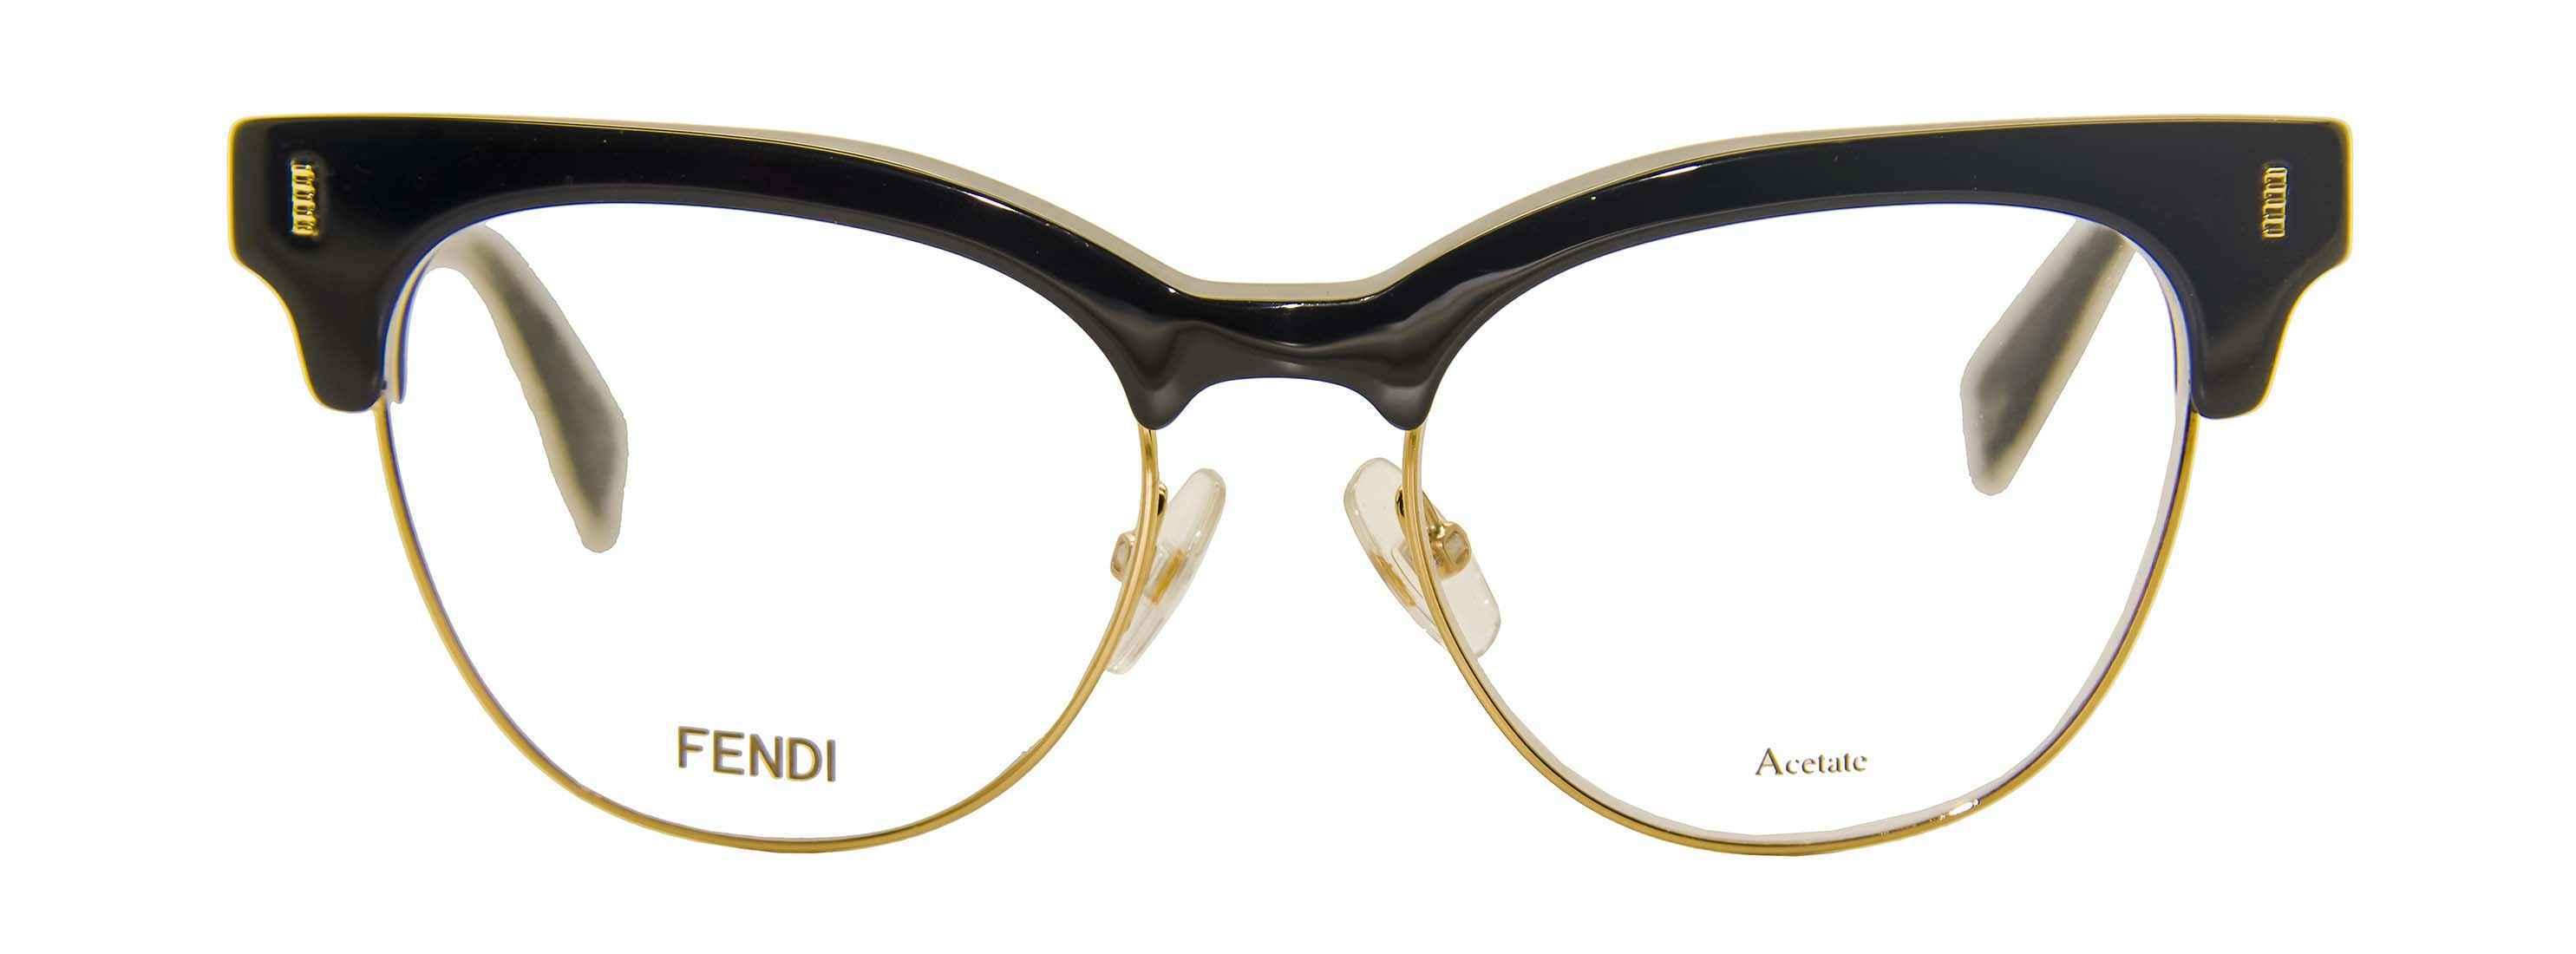 Fendi spectacles 0163 Vjg 01 2970x1100